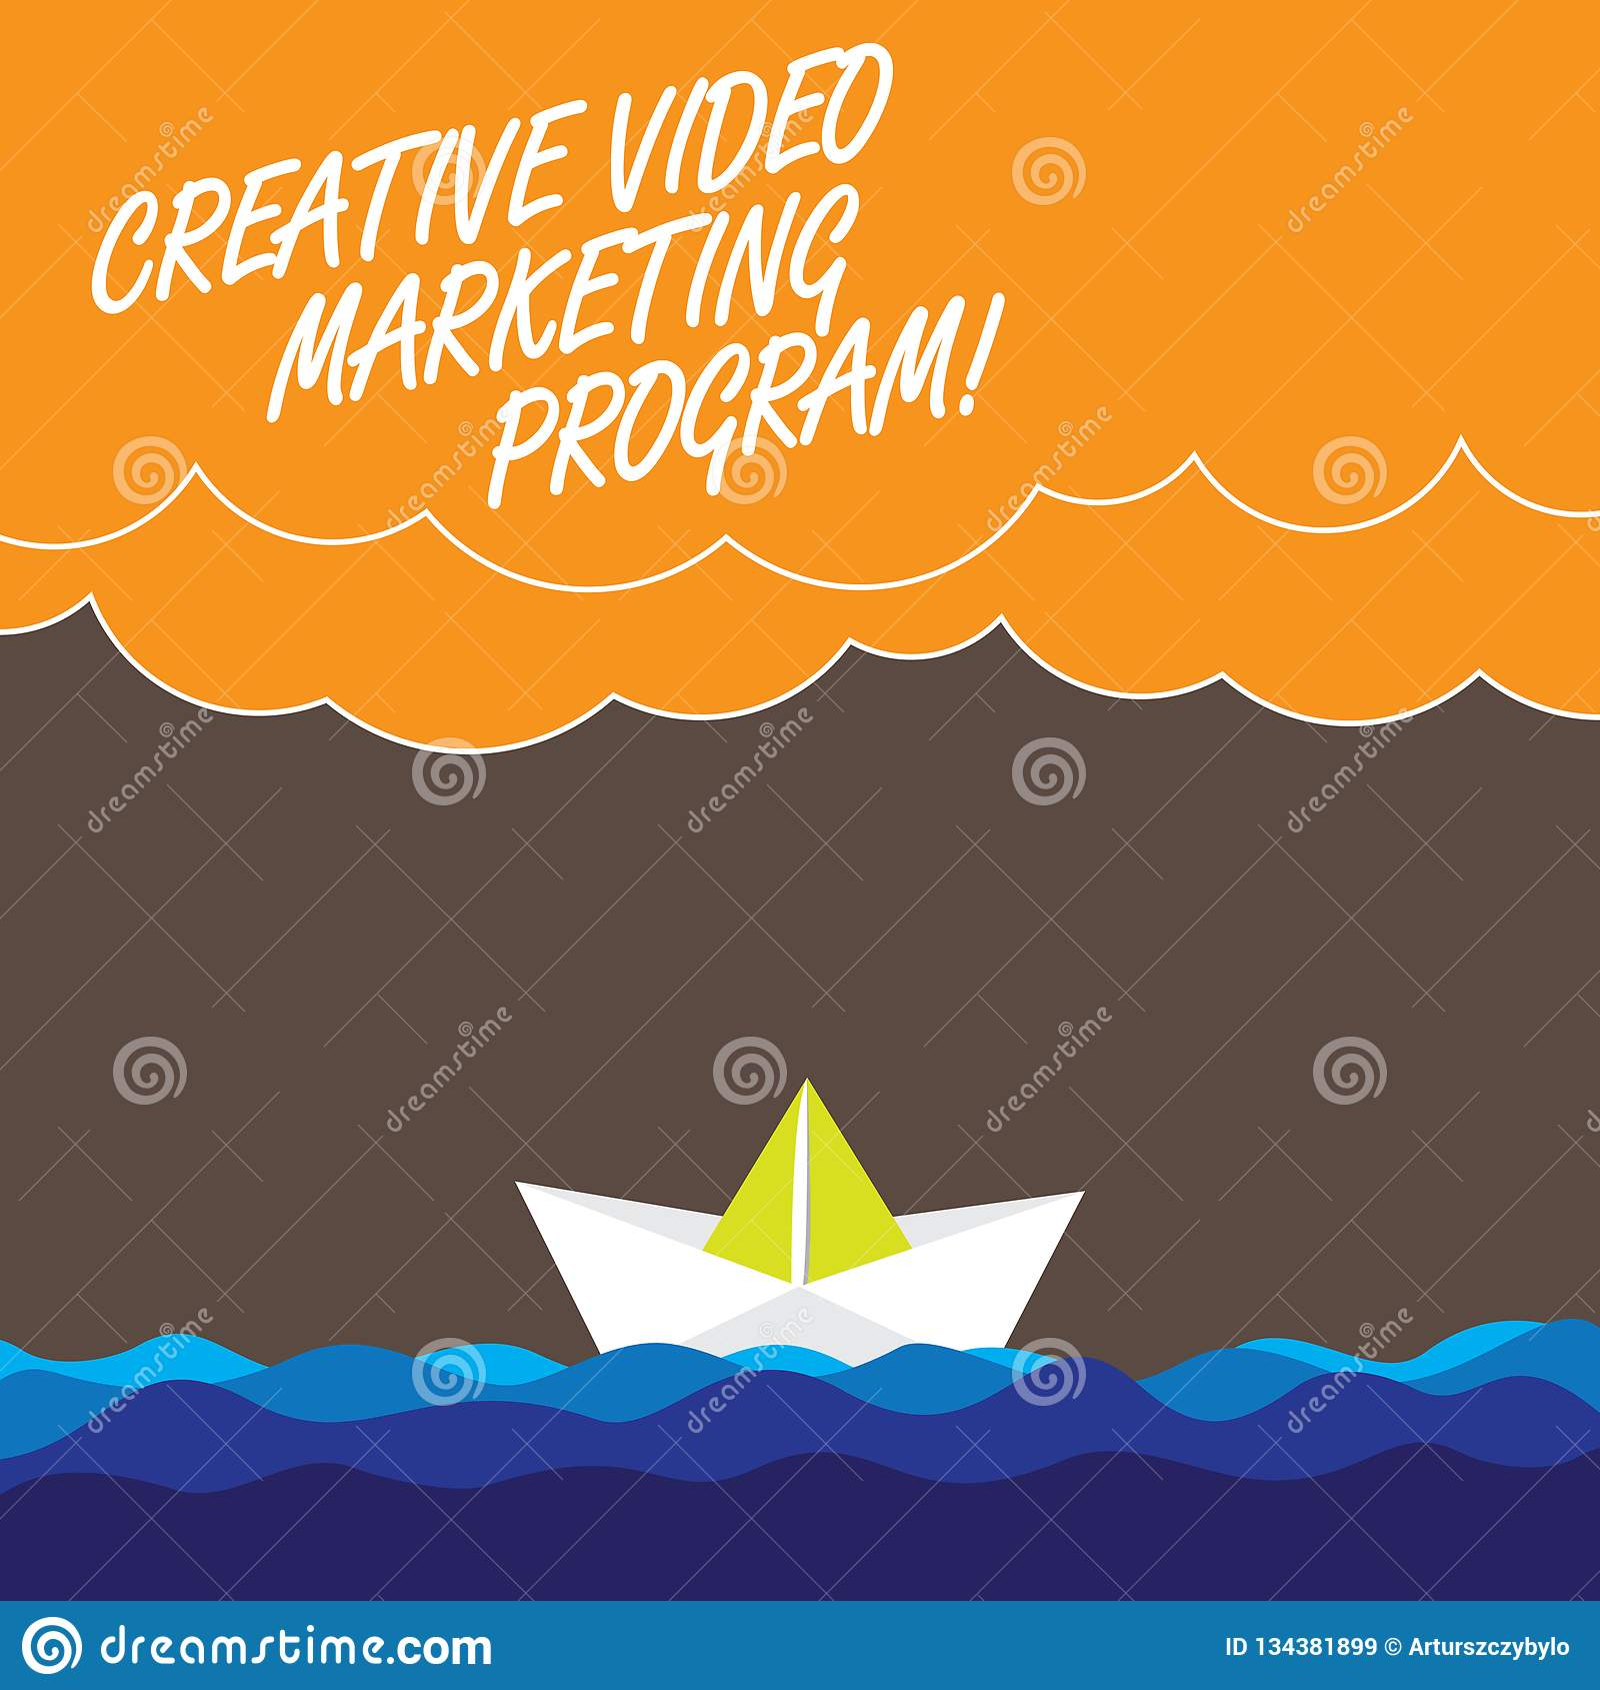 Creative Advertising Ideas Video